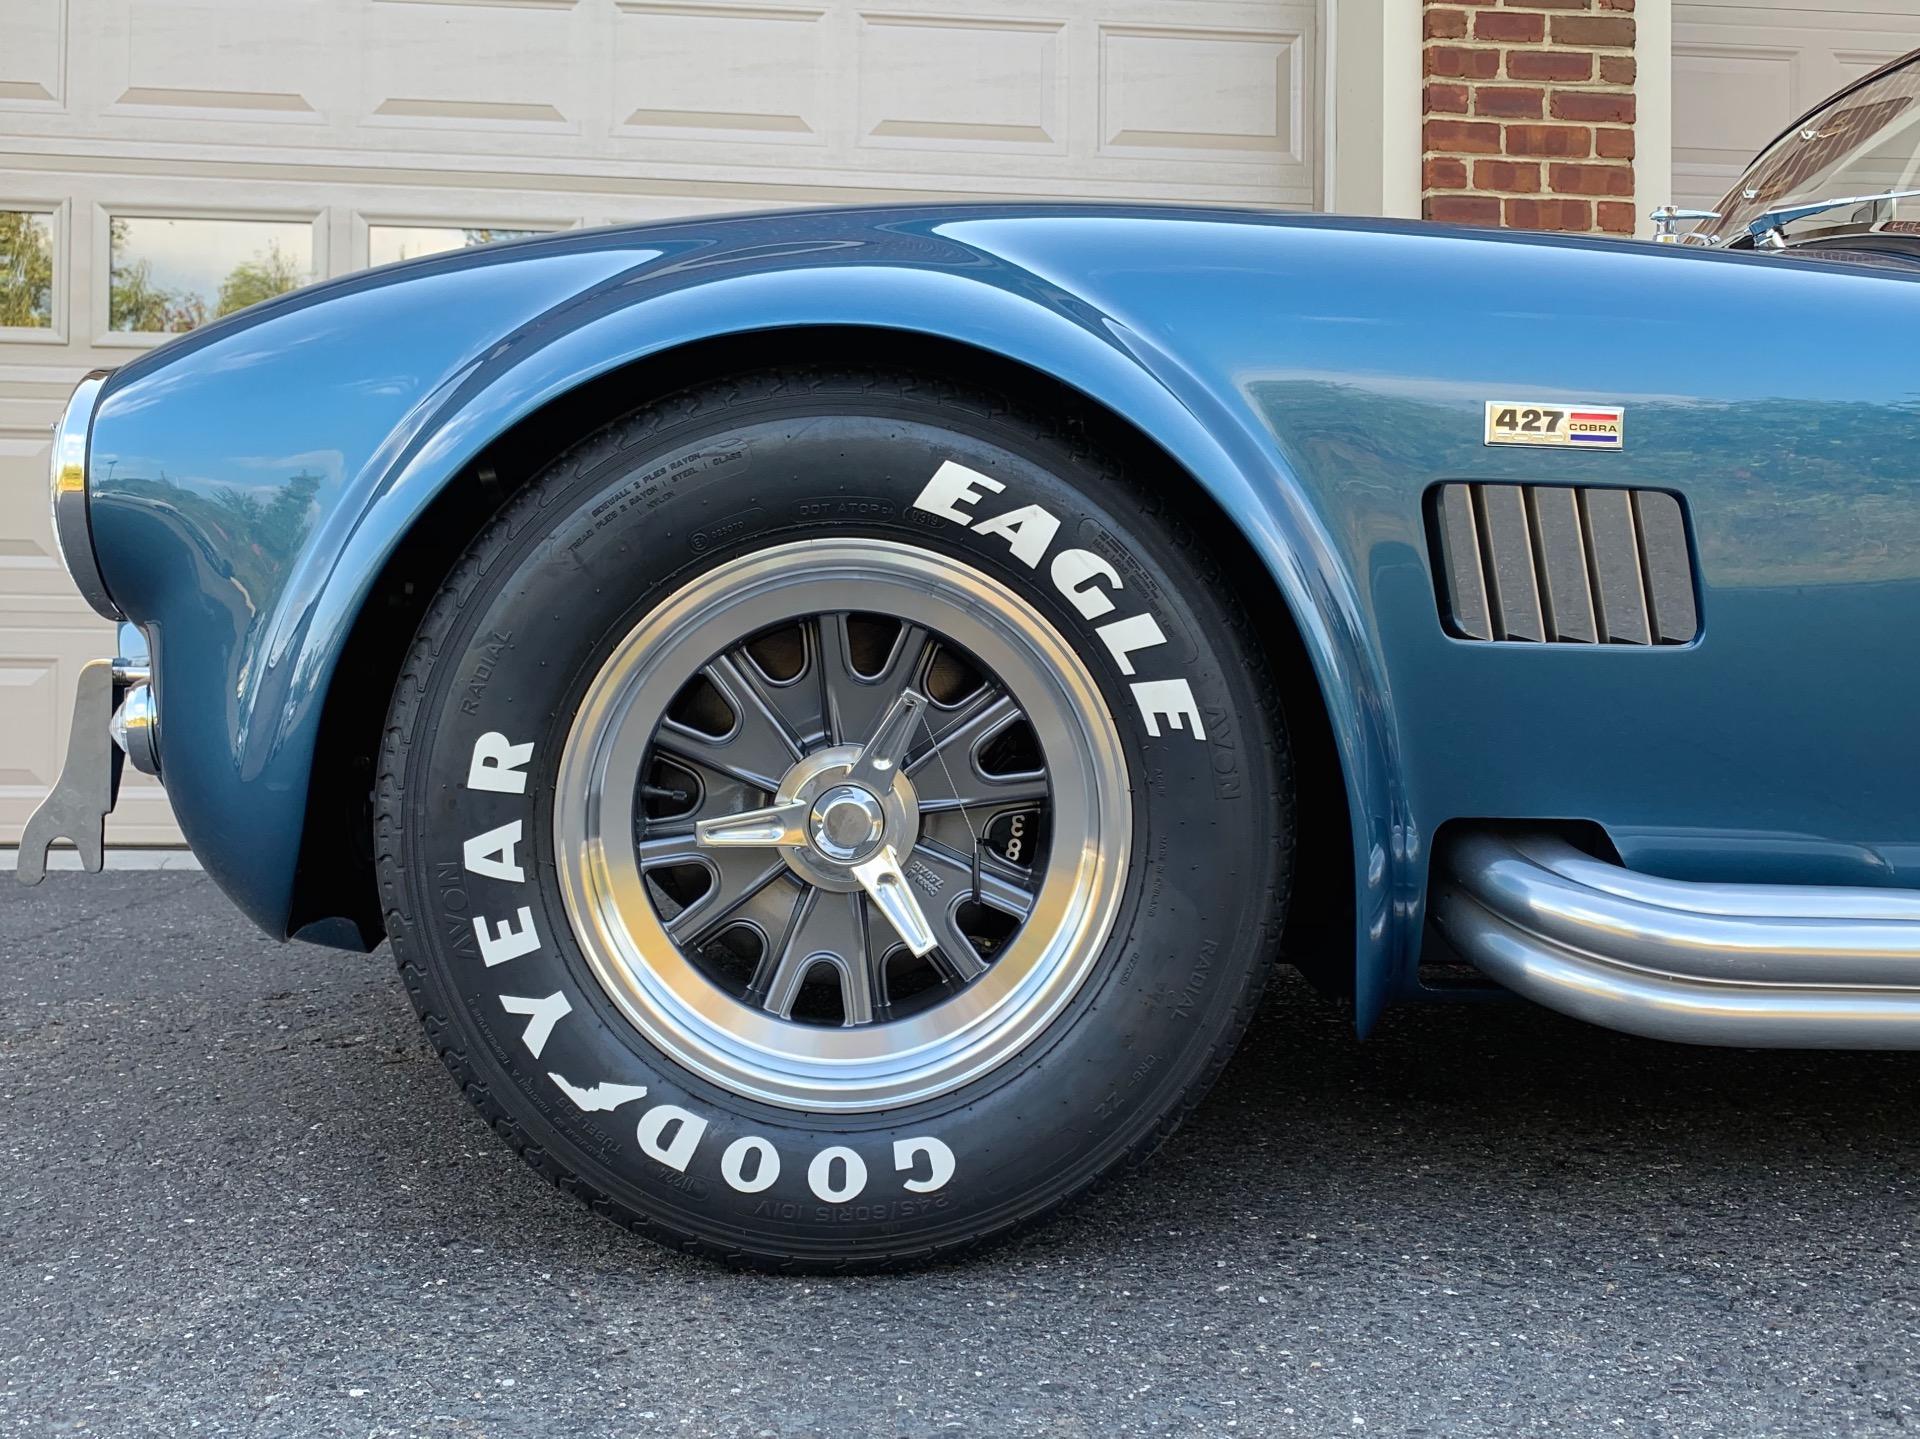 New-1965-Superformance-Mark-III-Cobra